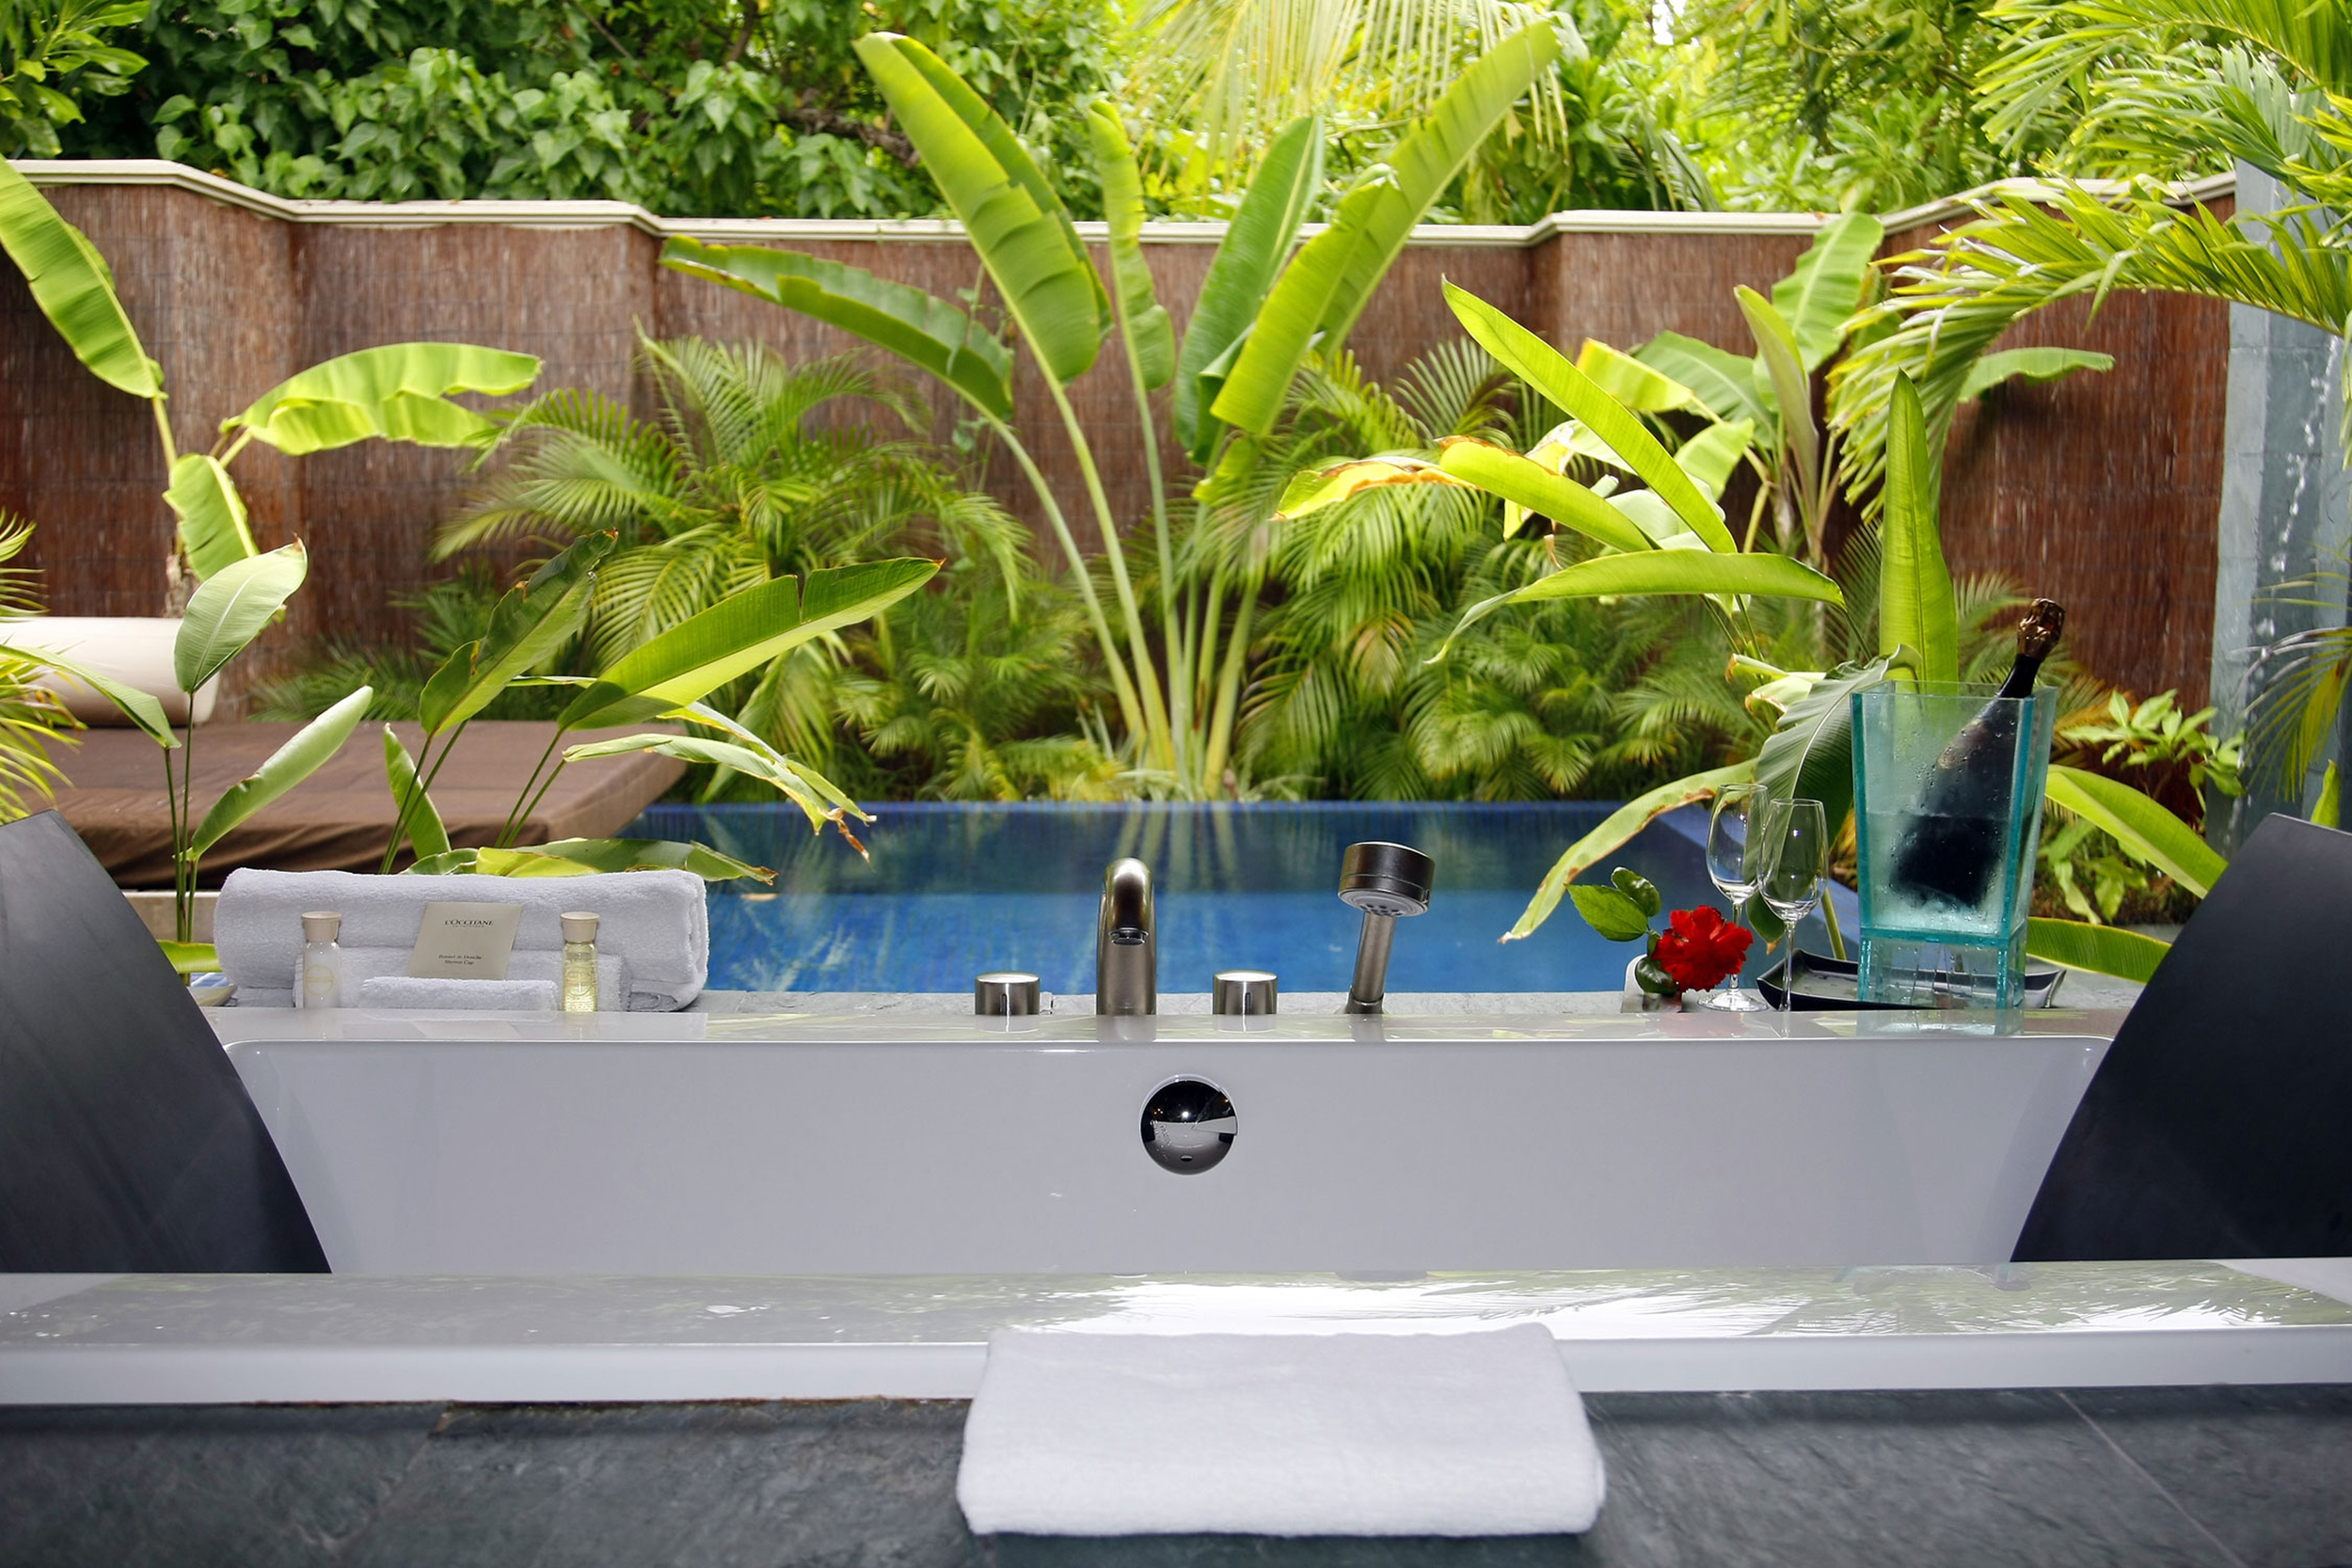 Hi_PHUV_59890037_Beach_Bungalow_With_Pool_Plunge_Pool.jpg